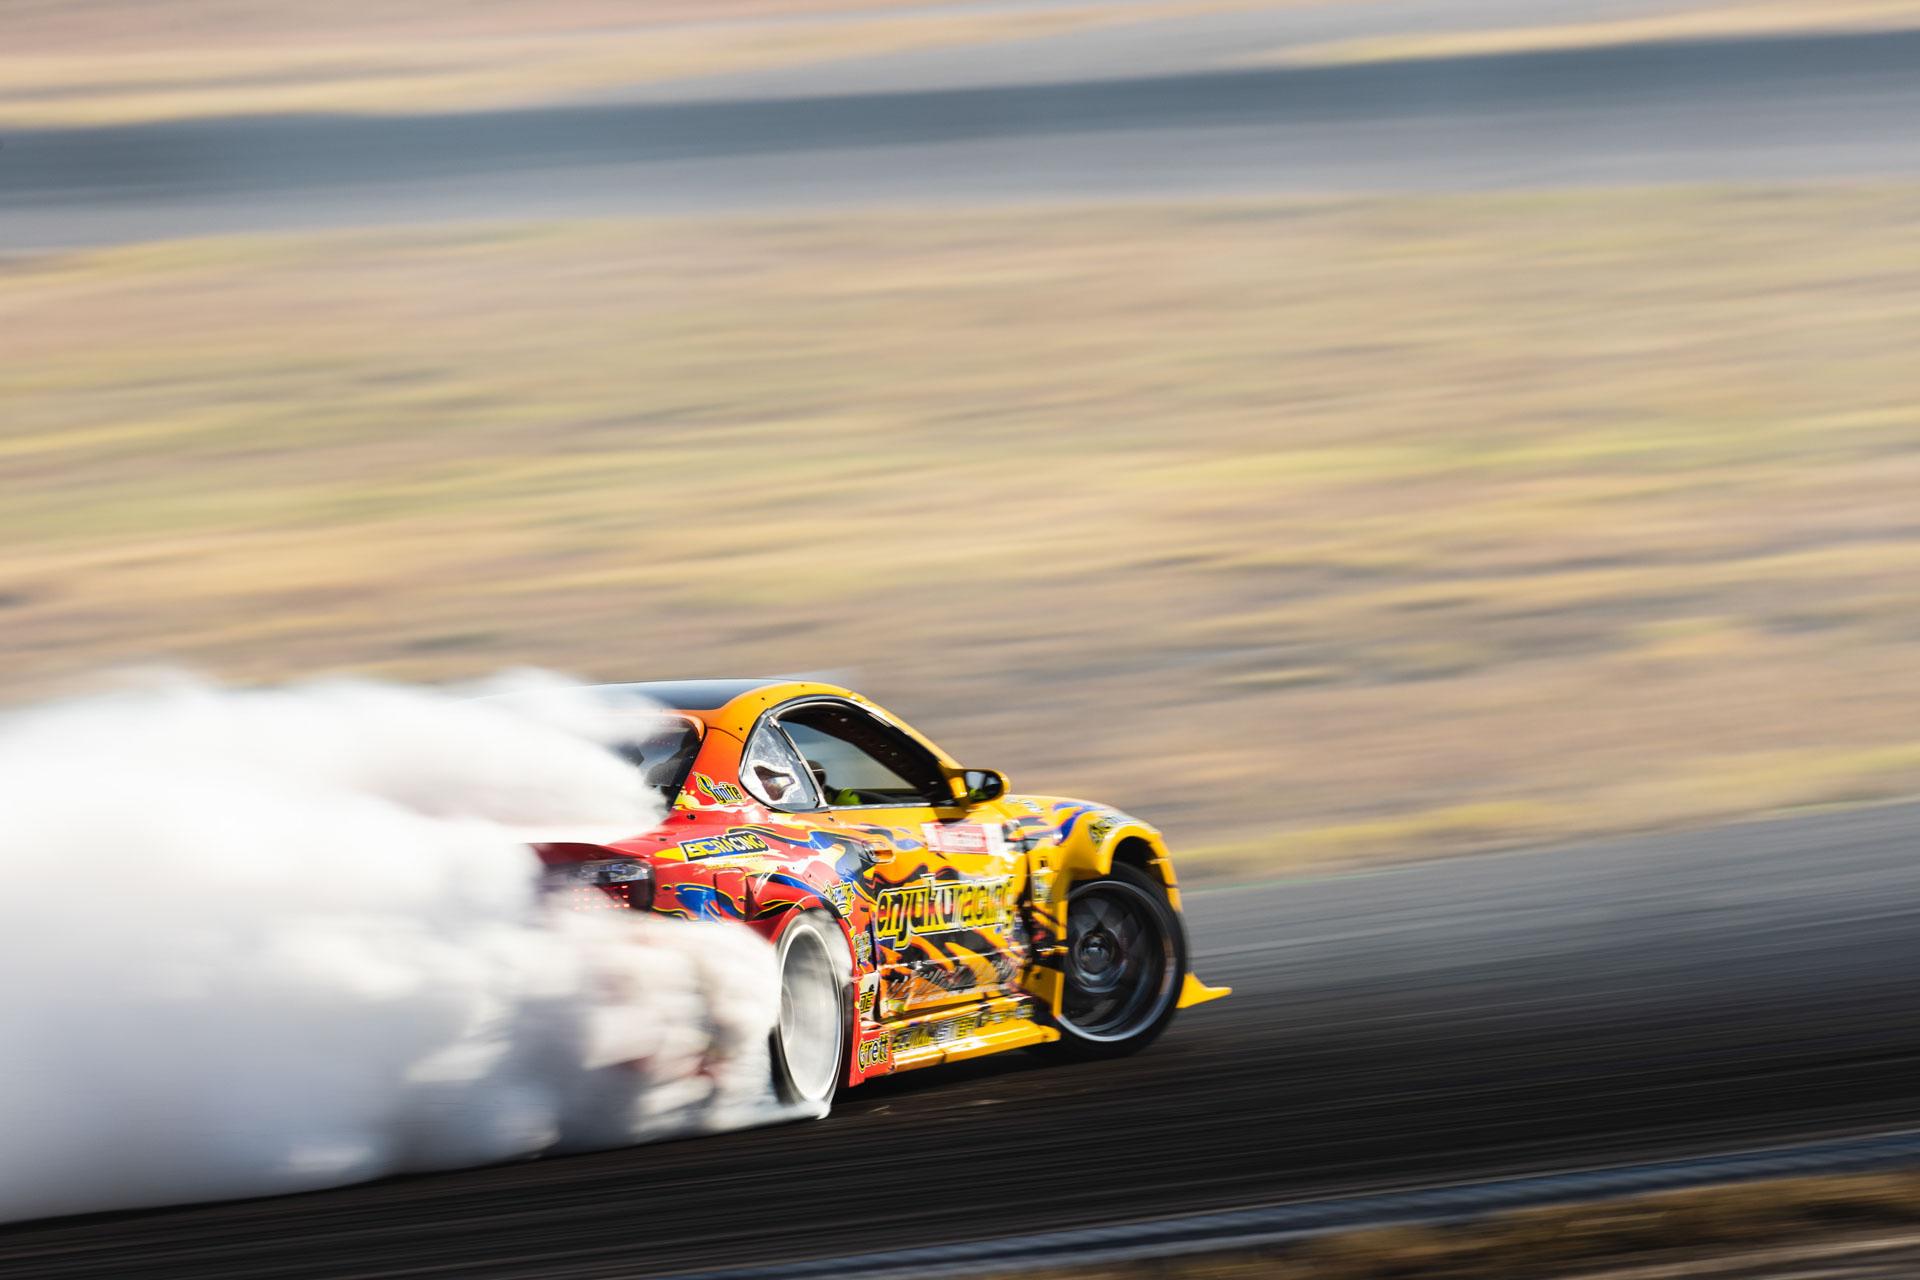 bc-racing-na-adam-lz-gallery-6983